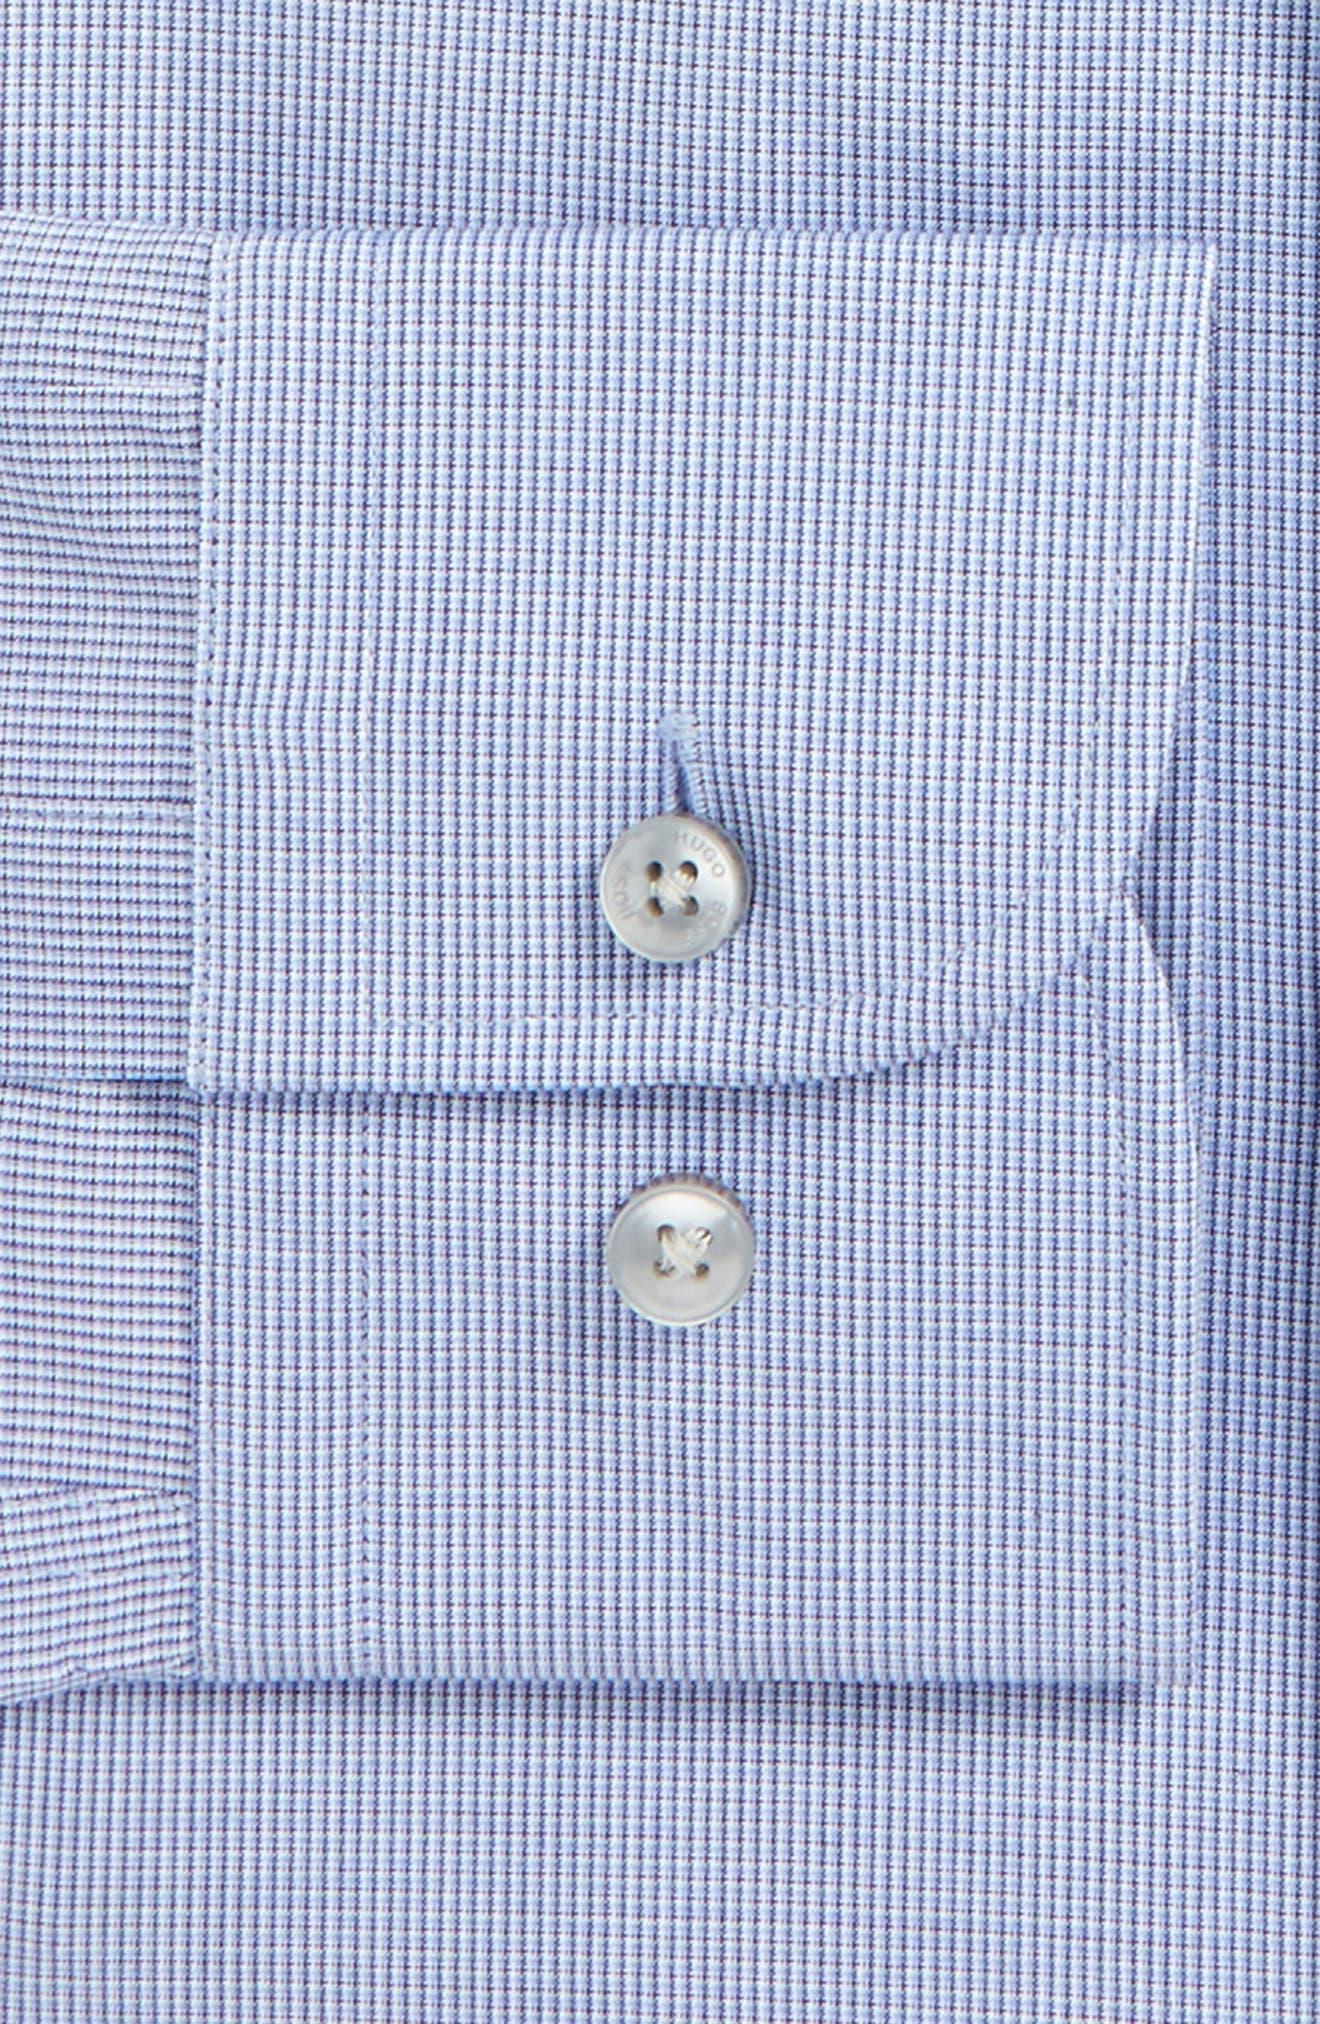 Jerris Slim Fit Easy Iron Check Dress Shirt,                             Alternate thumbnail 4, color,                             NAVY